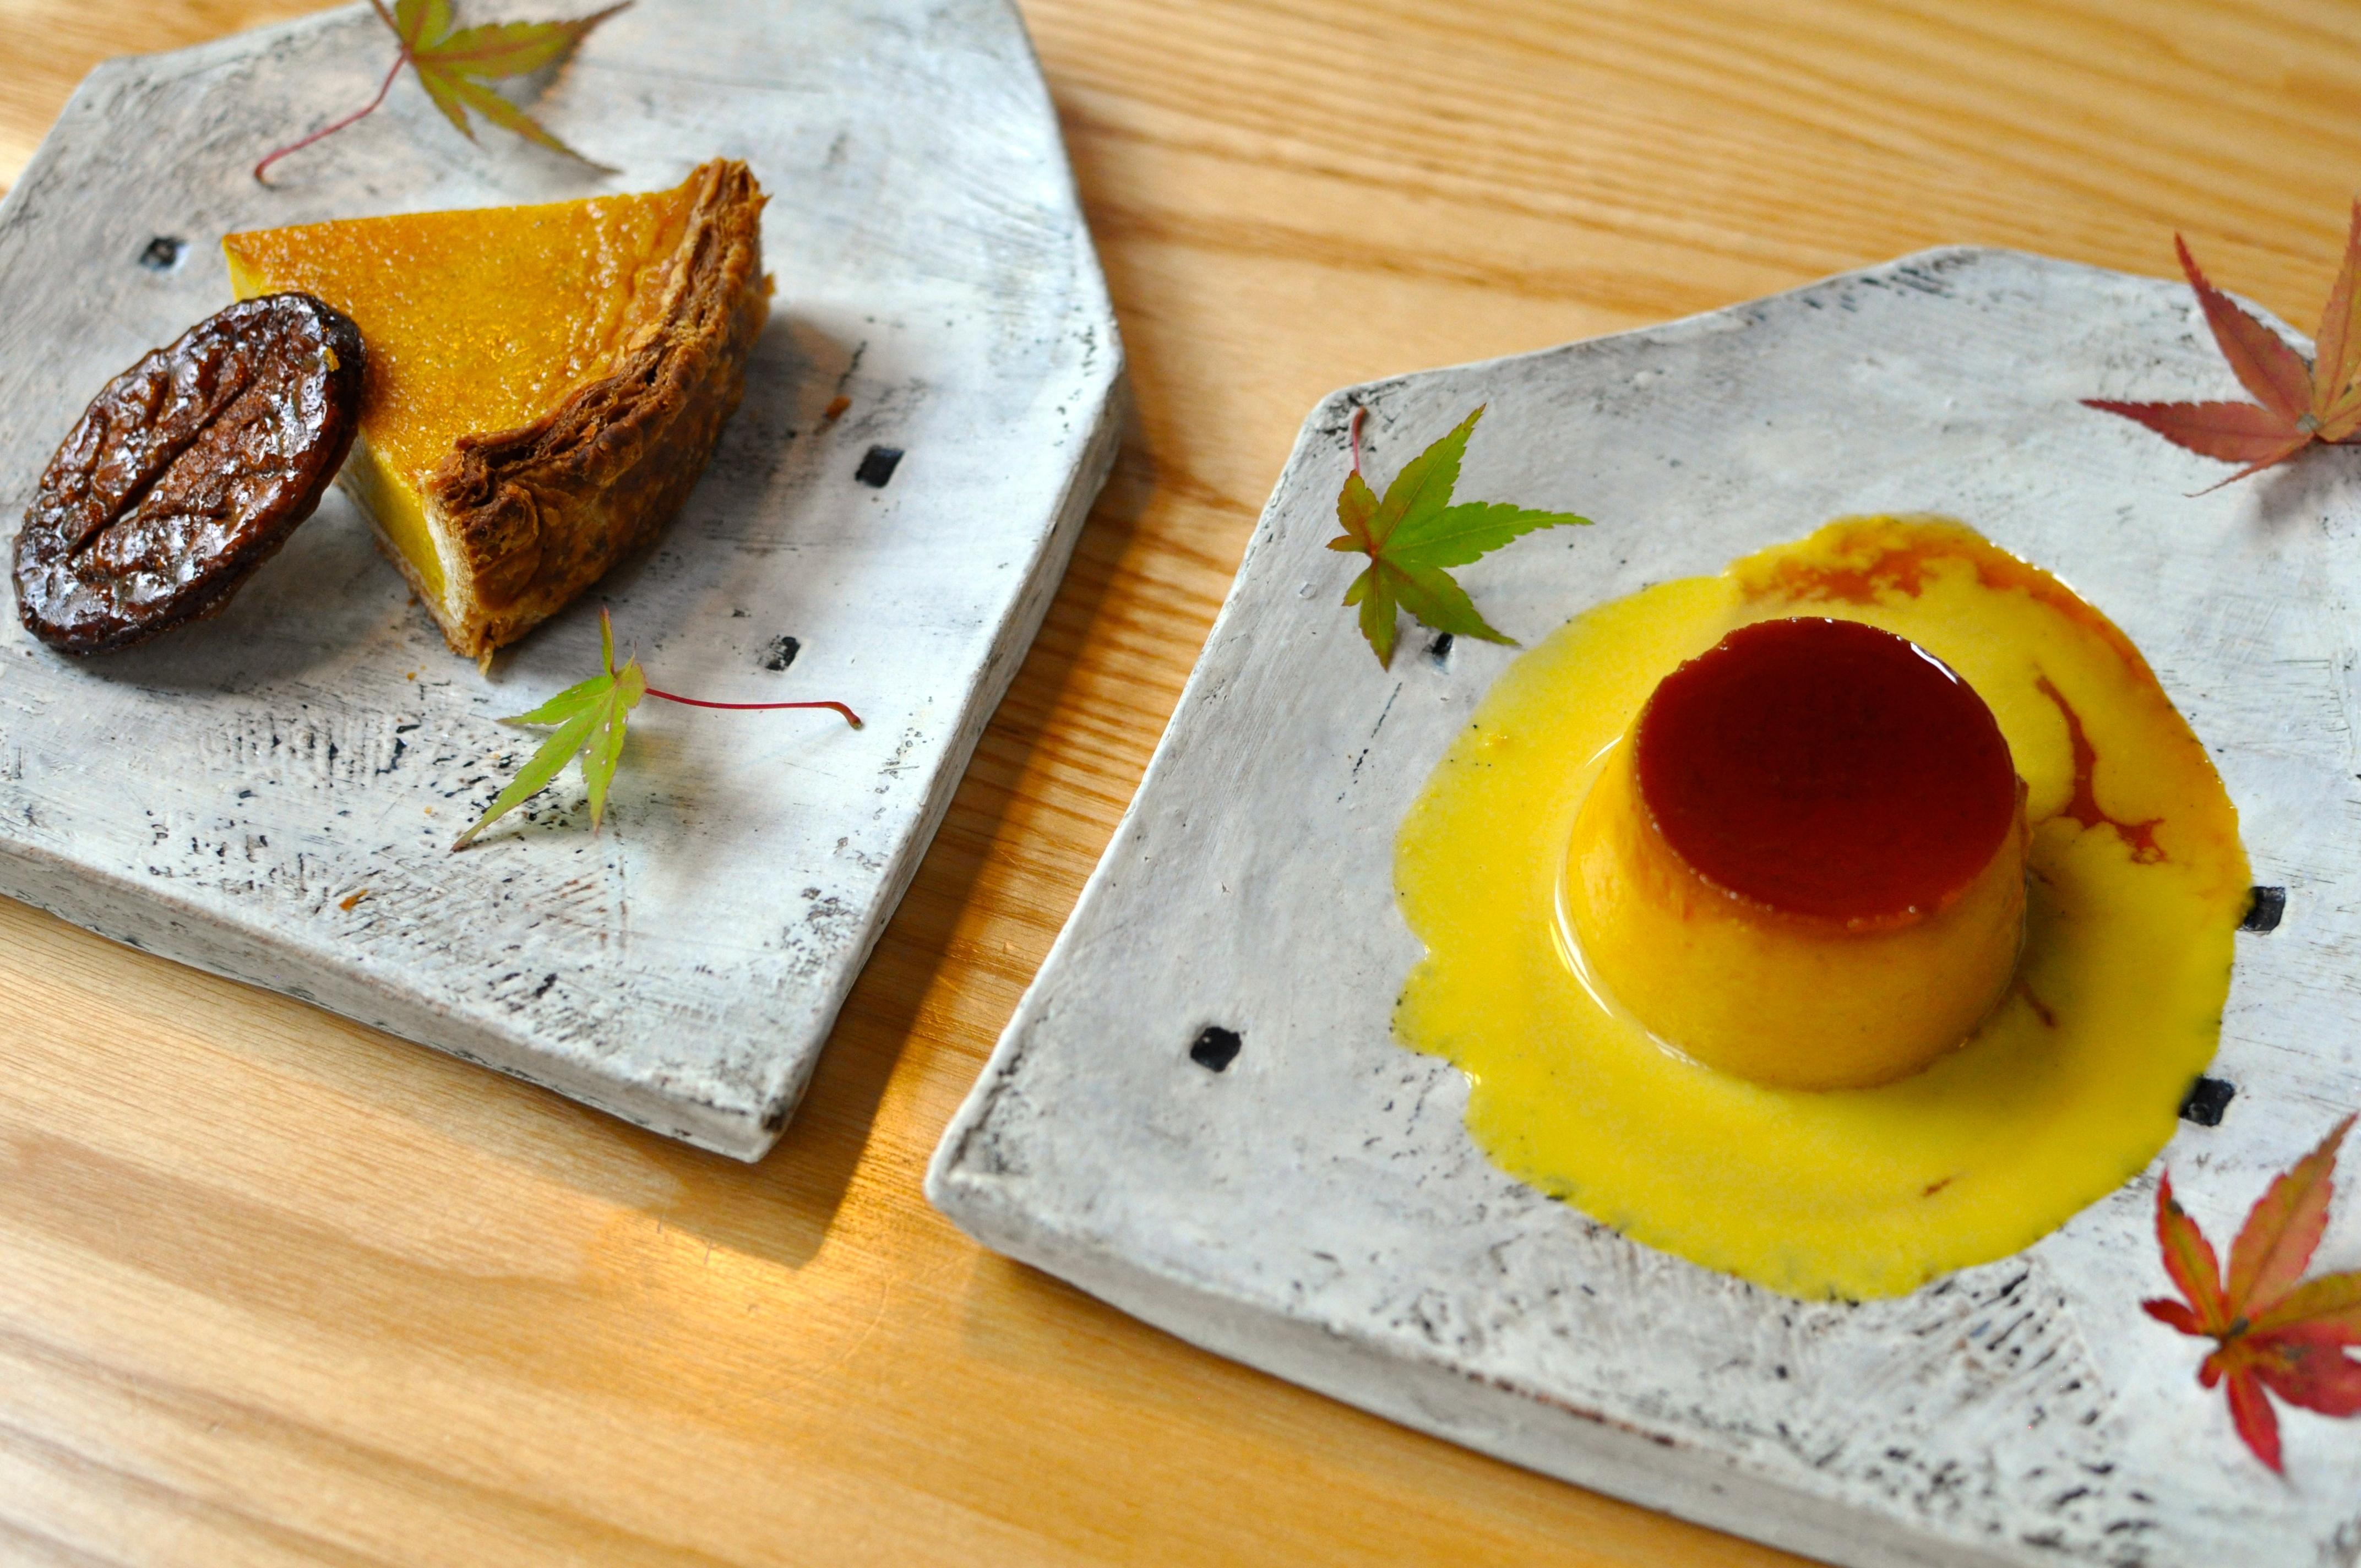 cafepolestar | 徳島県上勝町を五感で感じるカフェ・ポールスター